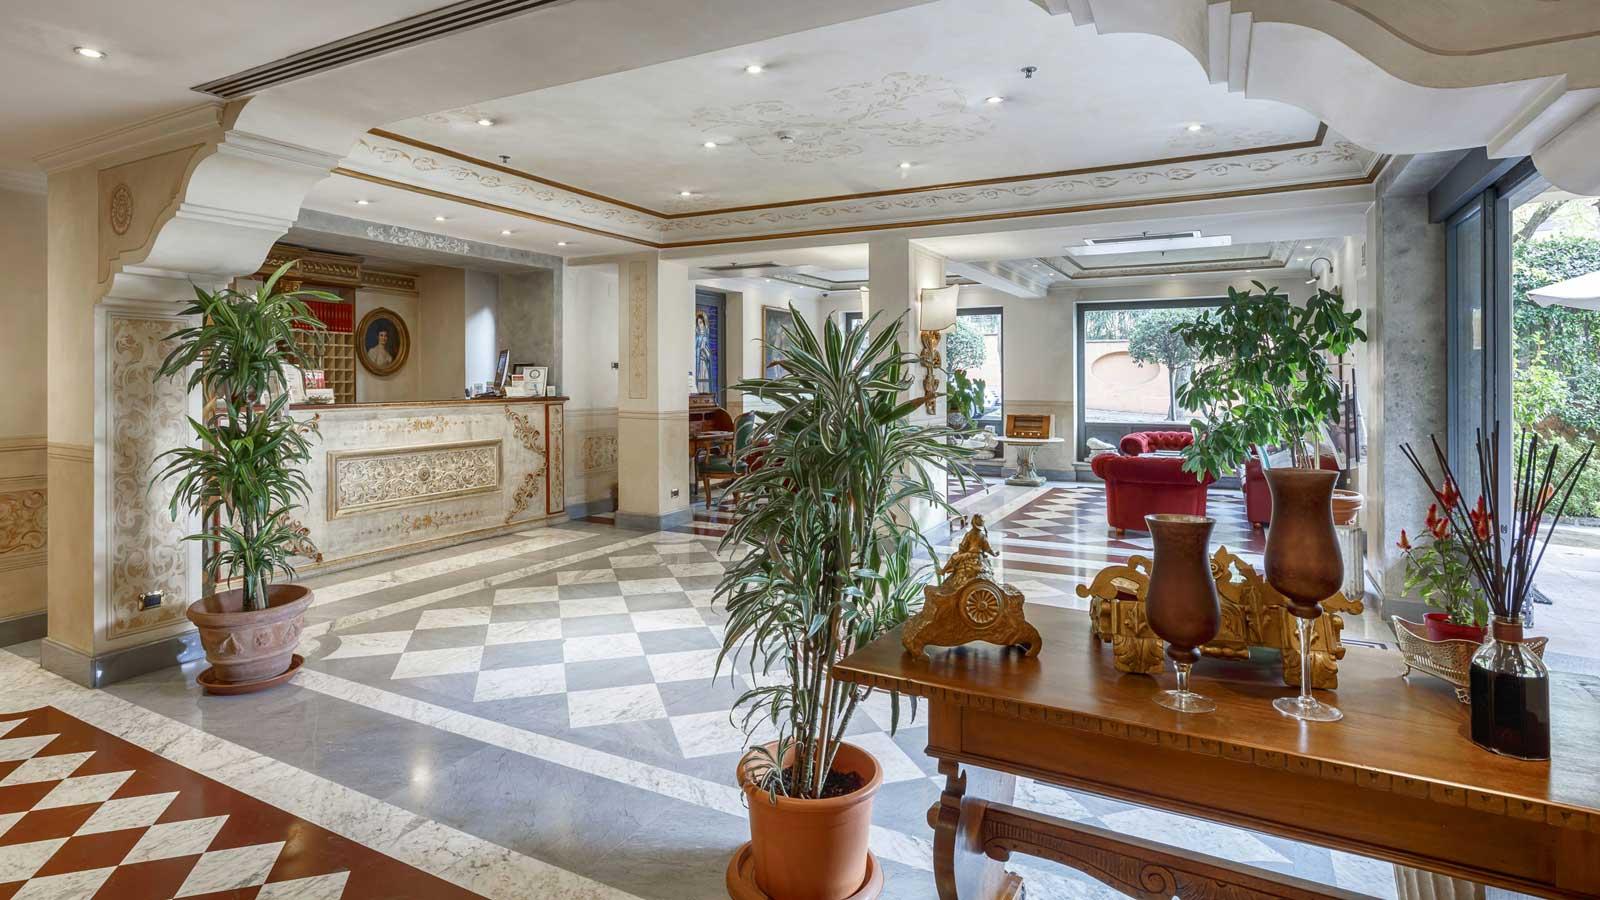 Hotel Villa San Pio, Rome Italy